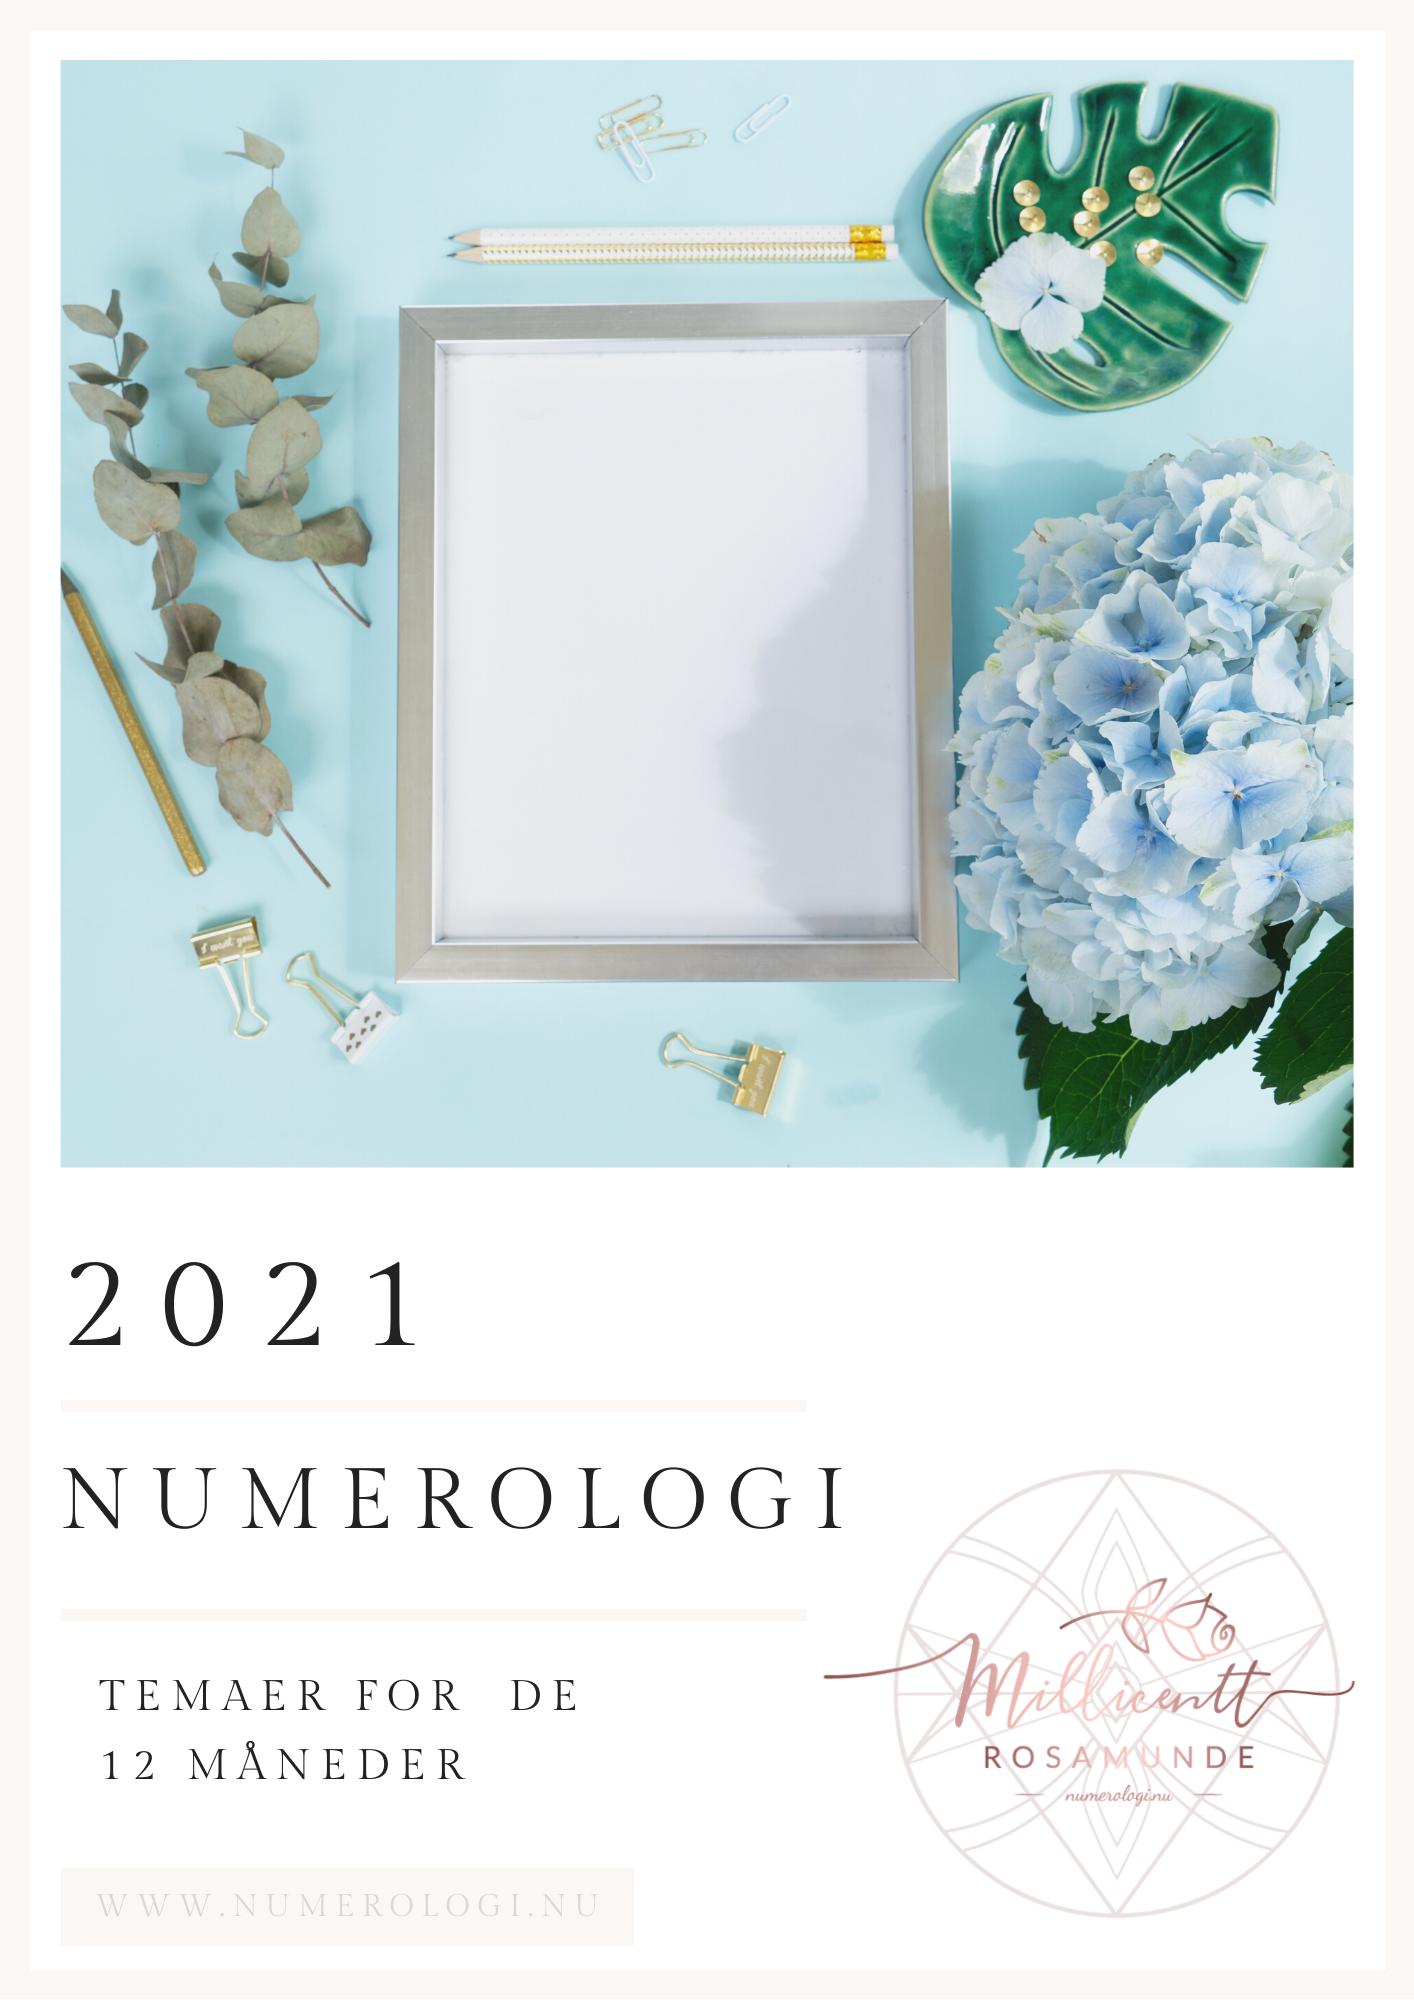 Numerologisk tema og energi i år 2021 - den klassiske numerologi - Millicentt Rosamunde Ét produkt pr. grundenergi.